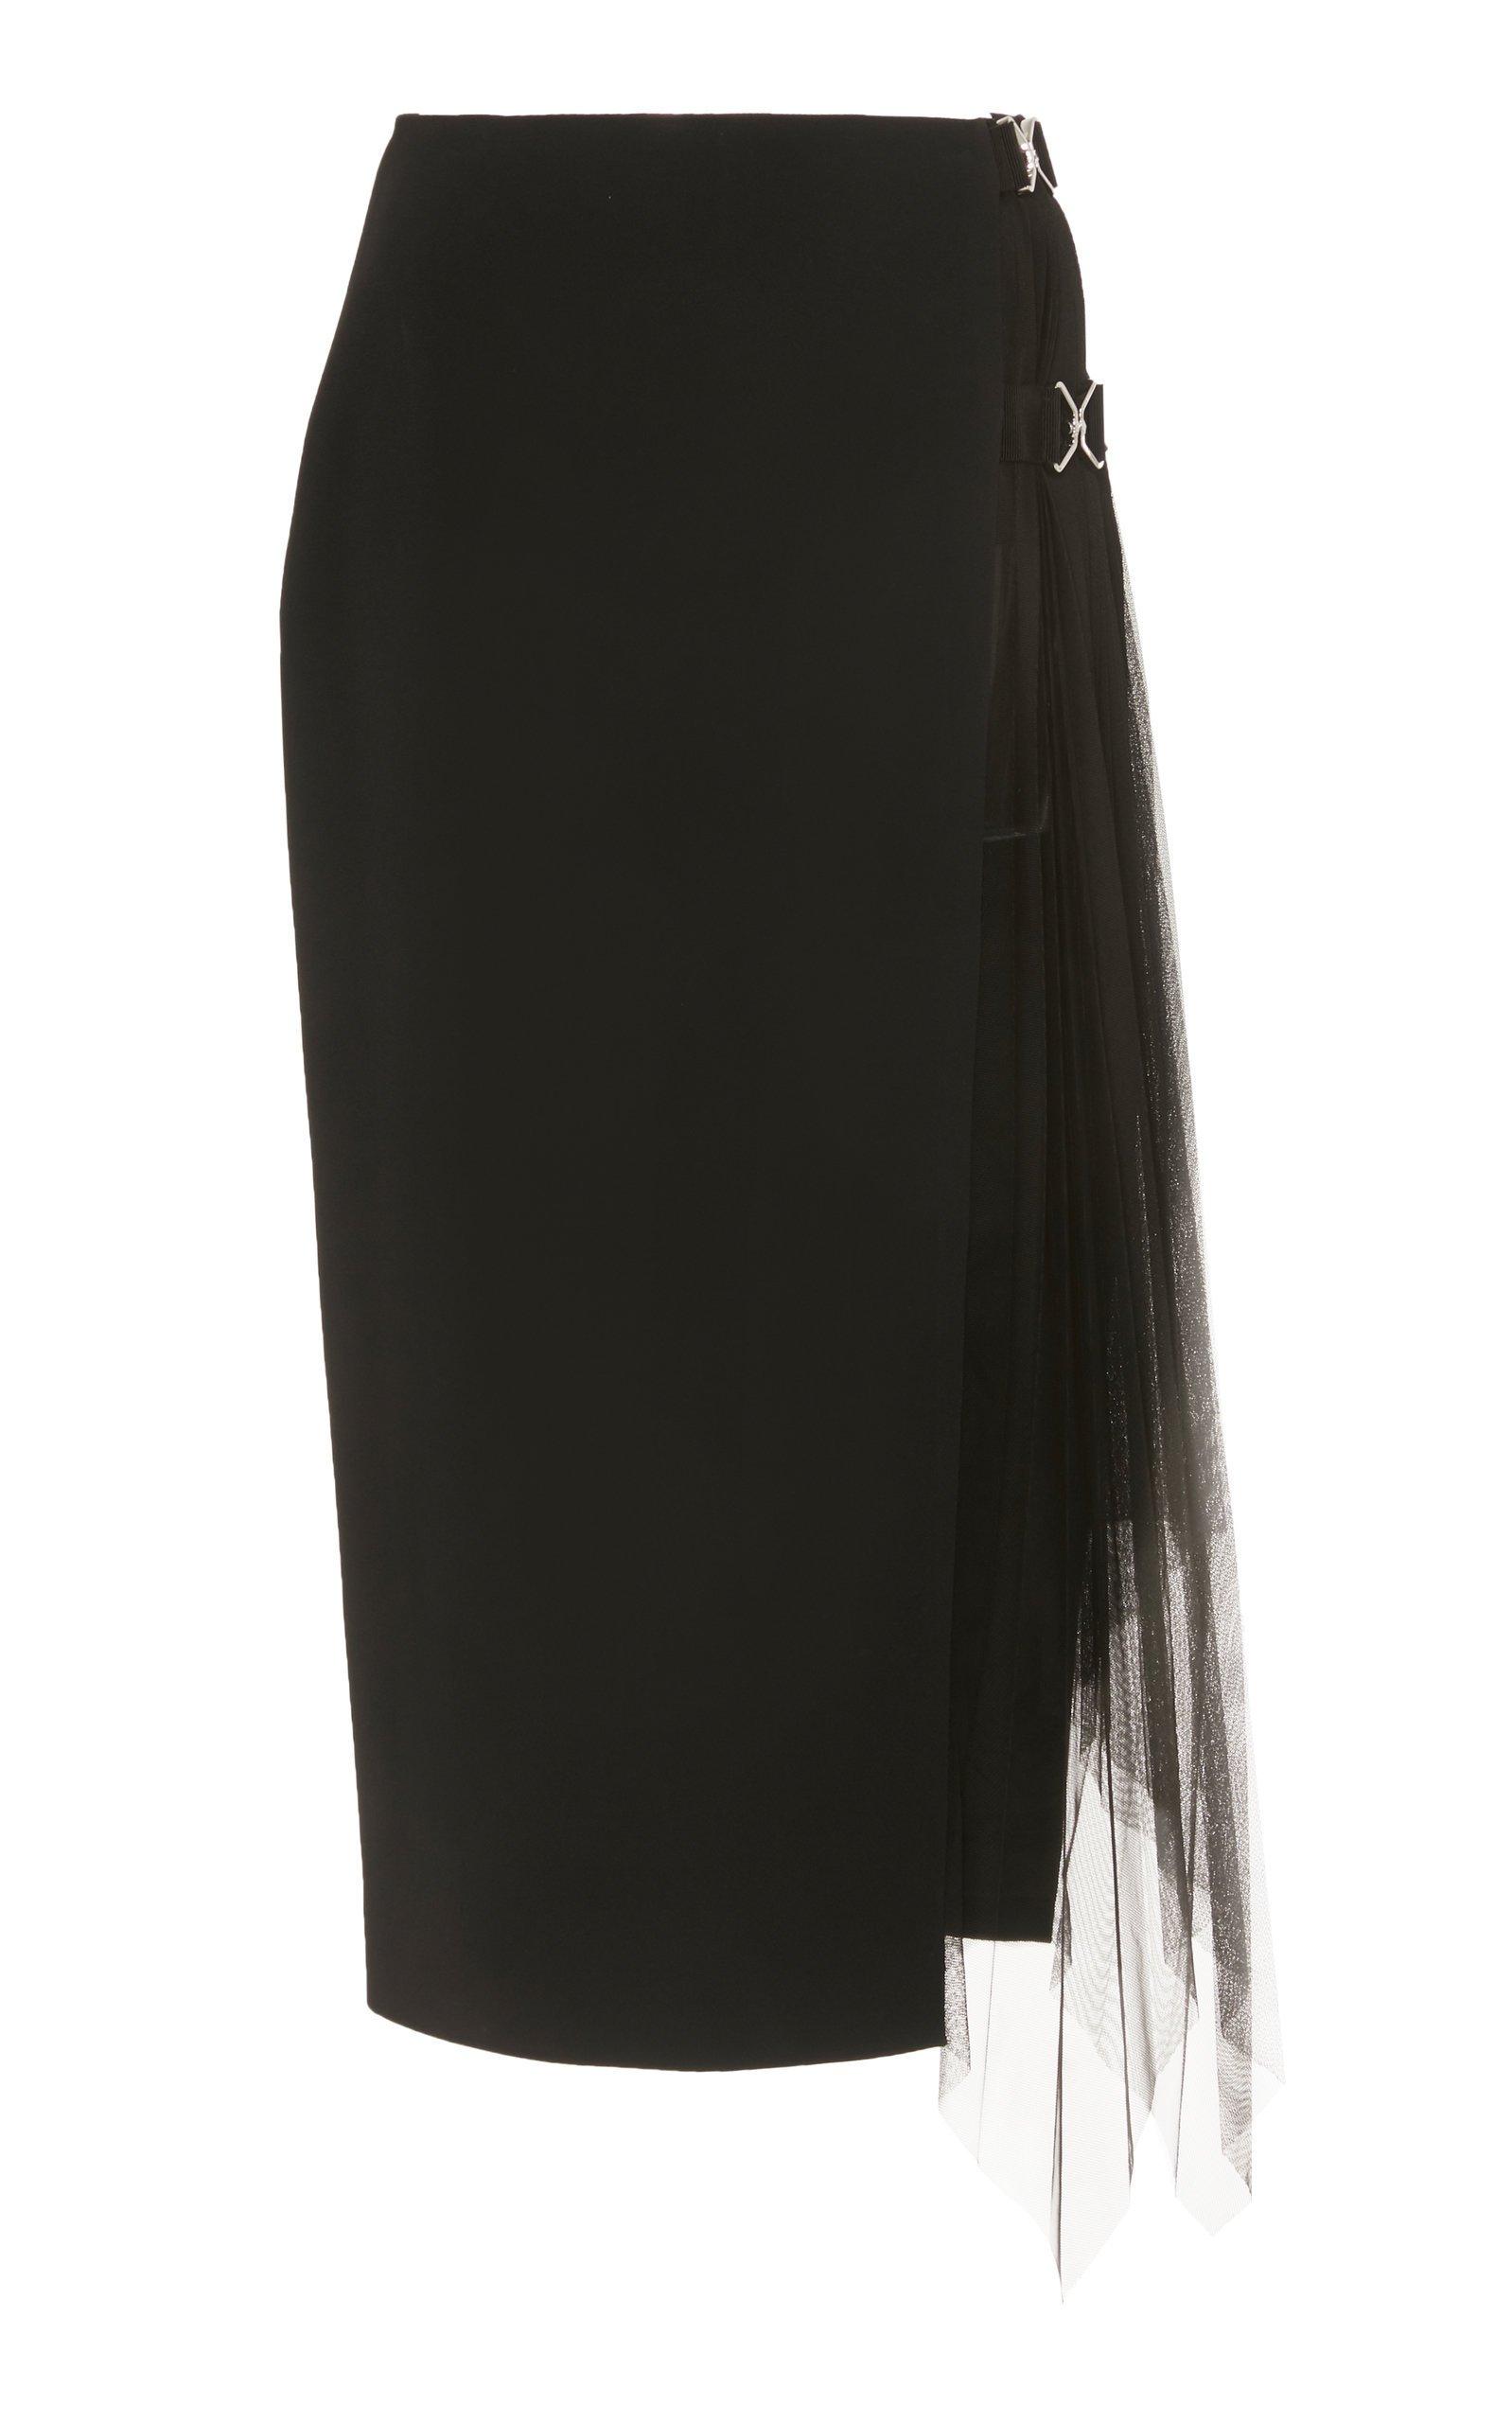 David Koma Side-Slit Tulle Pencil Skirt Size: 14